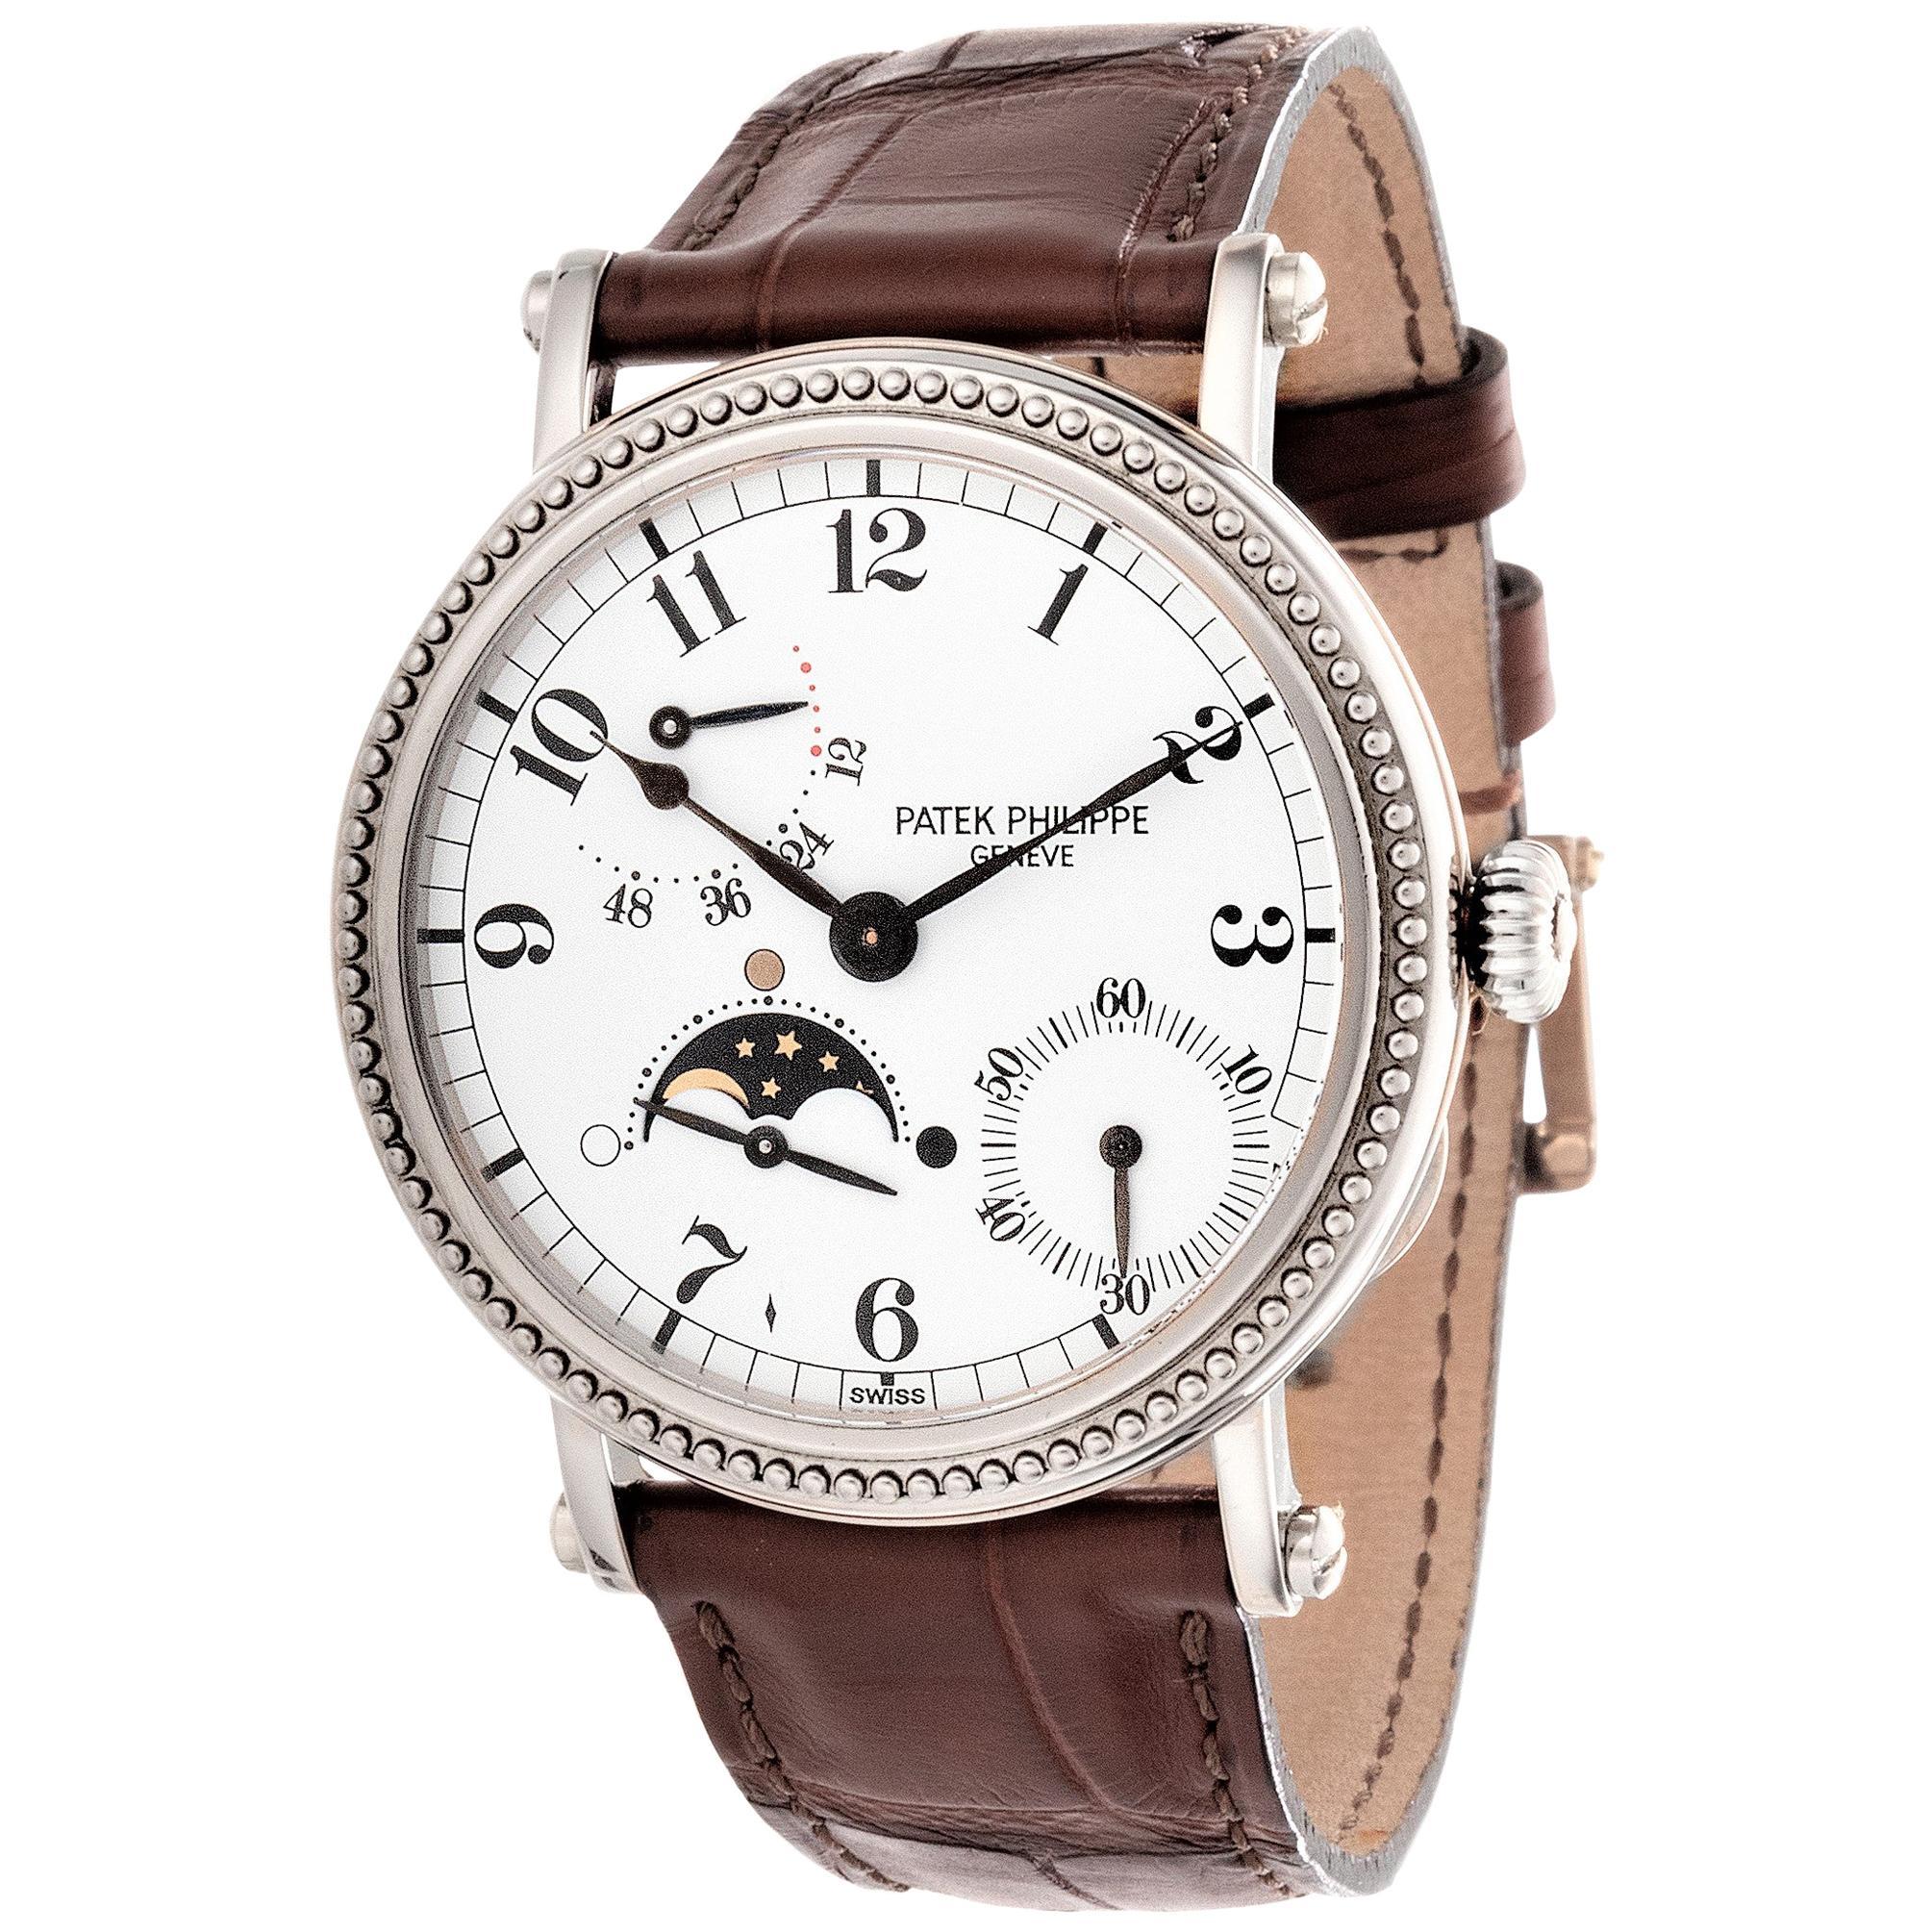 Patek Philippe 5015G Calatrava Watch